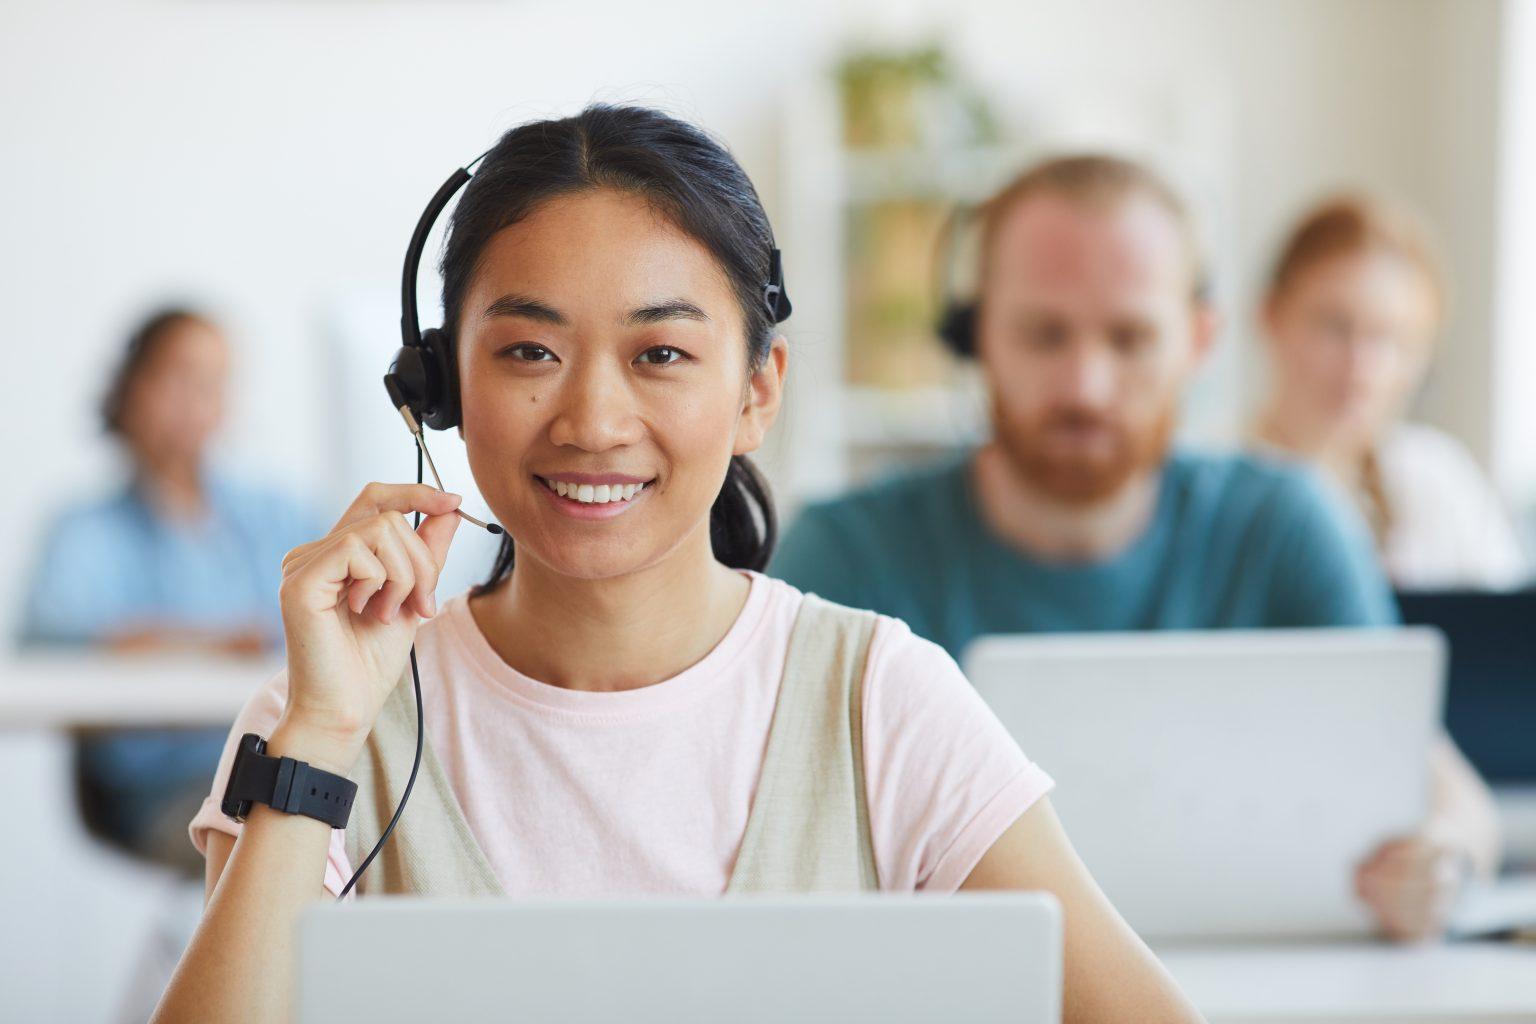 Outsourcing Customer Service & Telemarketing - MyRobin